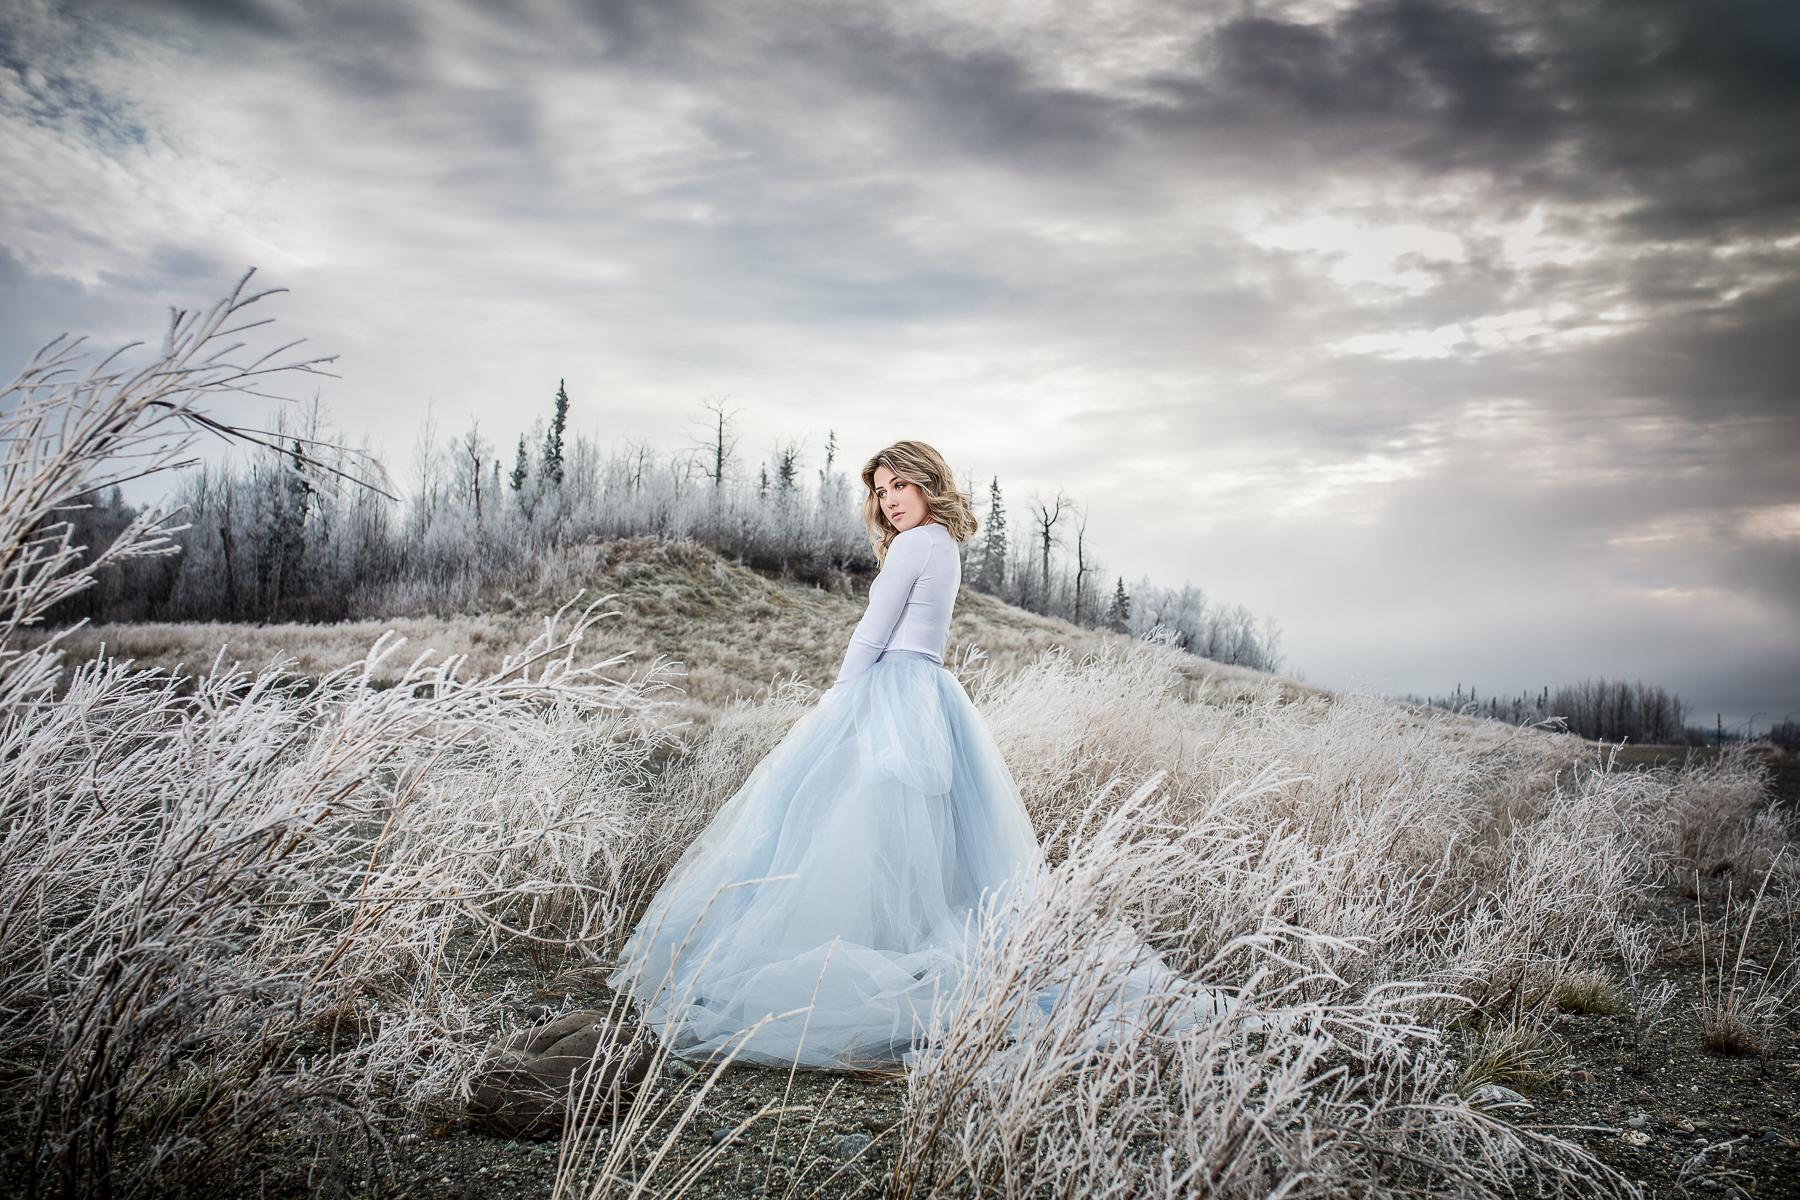 princess-044-Edit-Edit-2.jpg